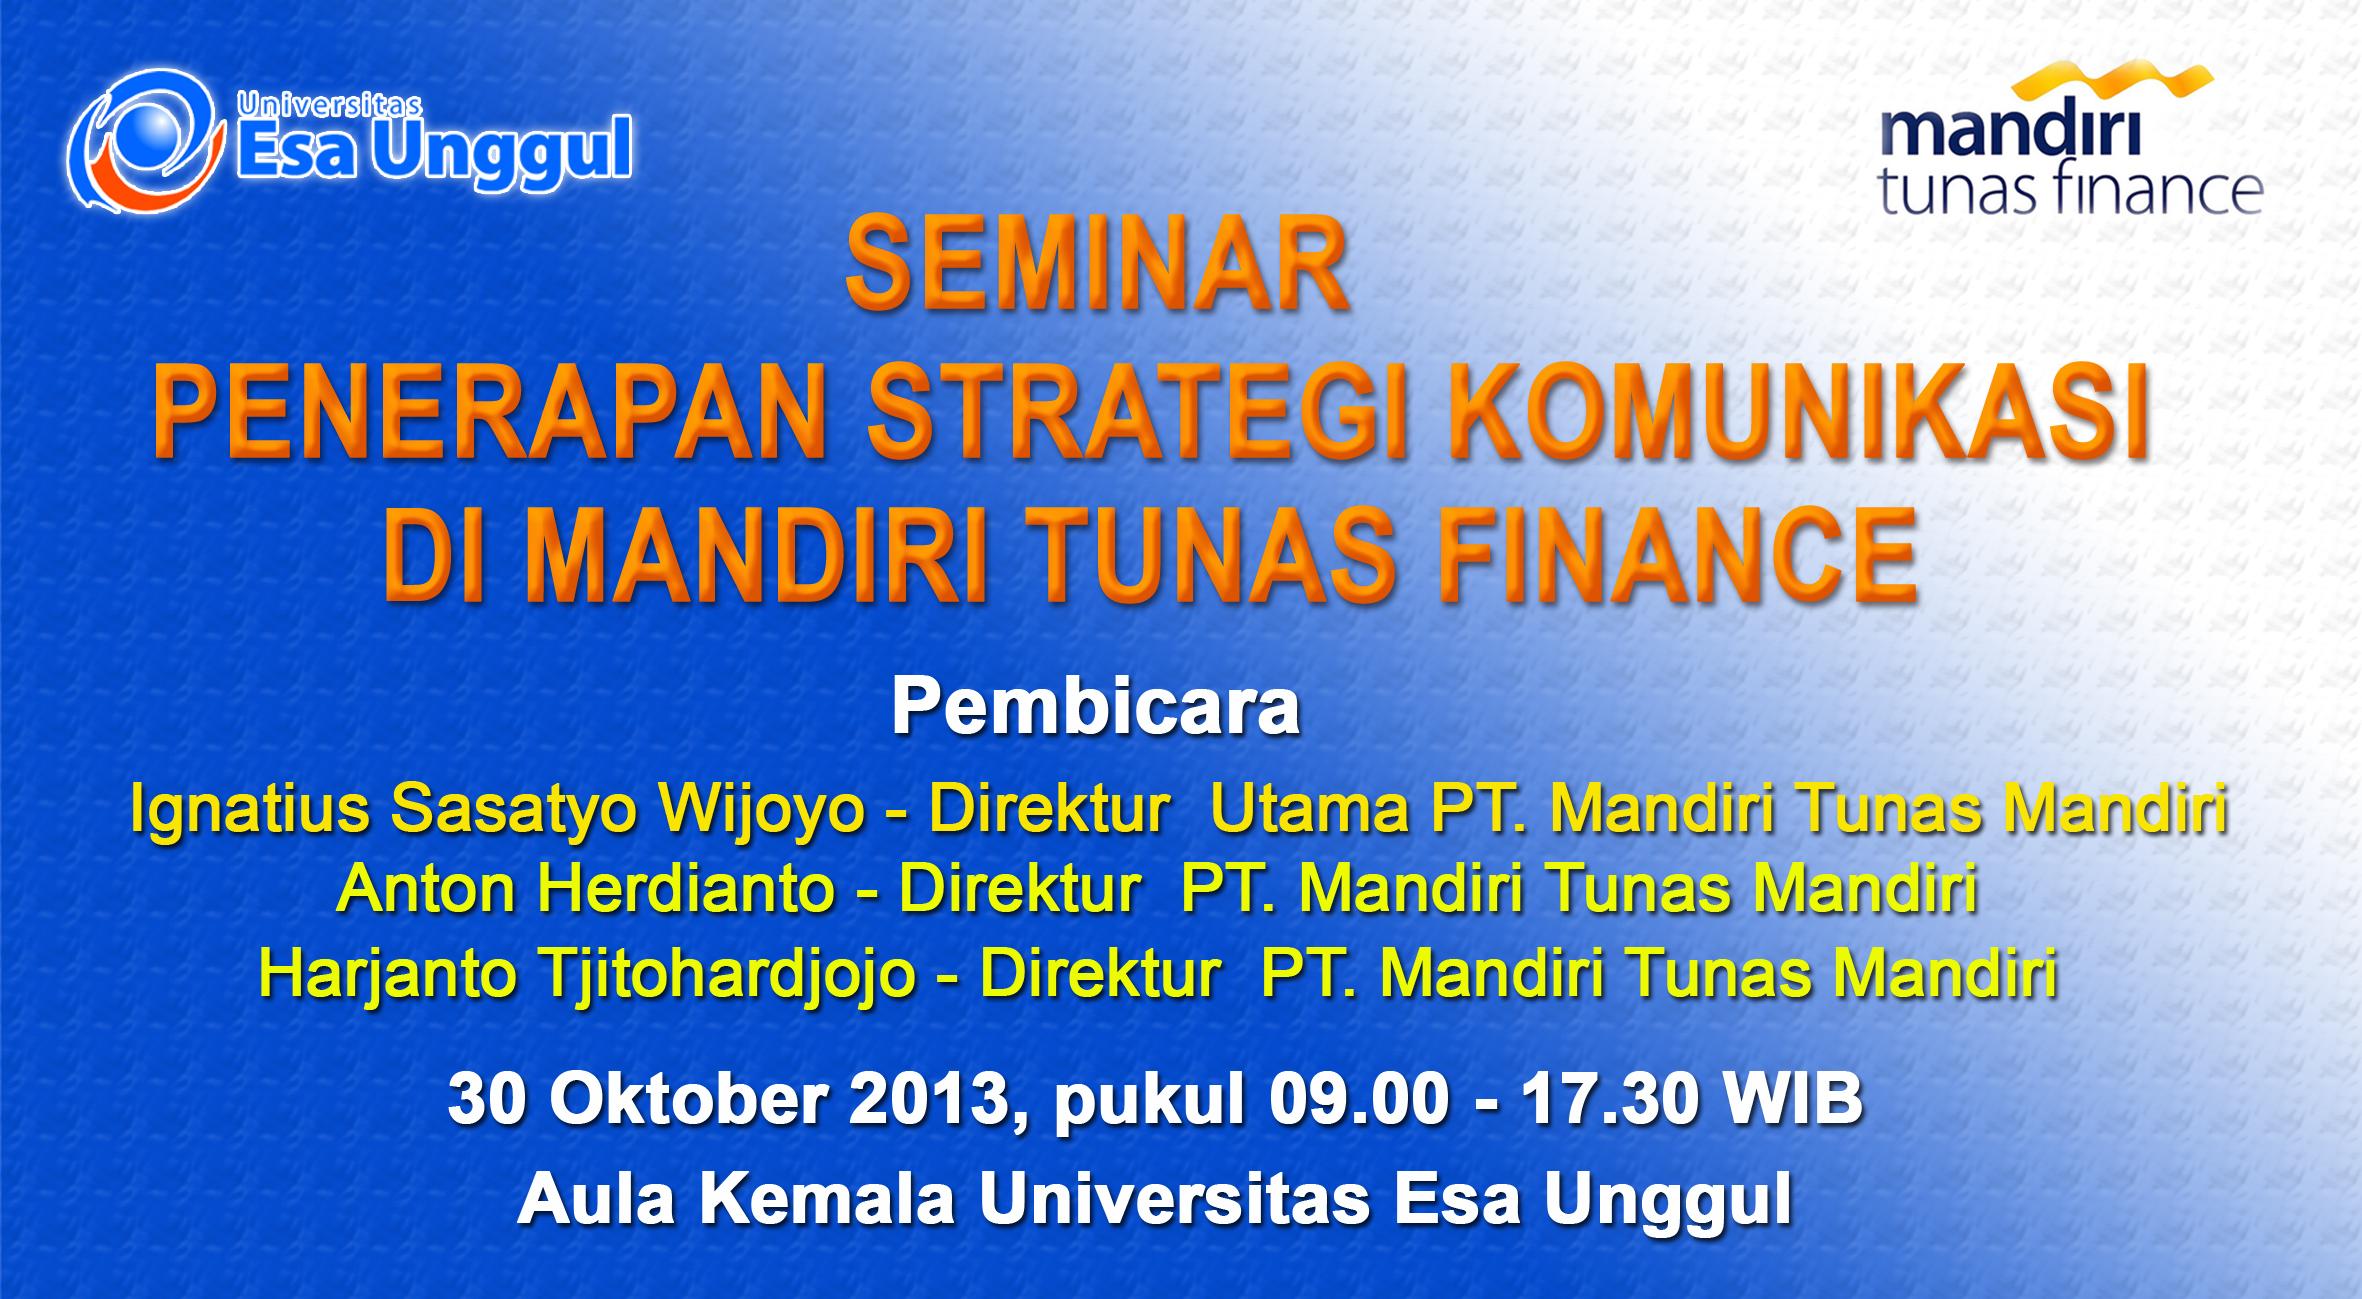 FIKOM Universitas Esa Unggul bekerjasama dengan PT. Mandiri Tunas Mandiri (PT. MTF) menyelenggarakan Seminar Penerapan Strategi Komunikasi Di Mandiri Tunas Finance